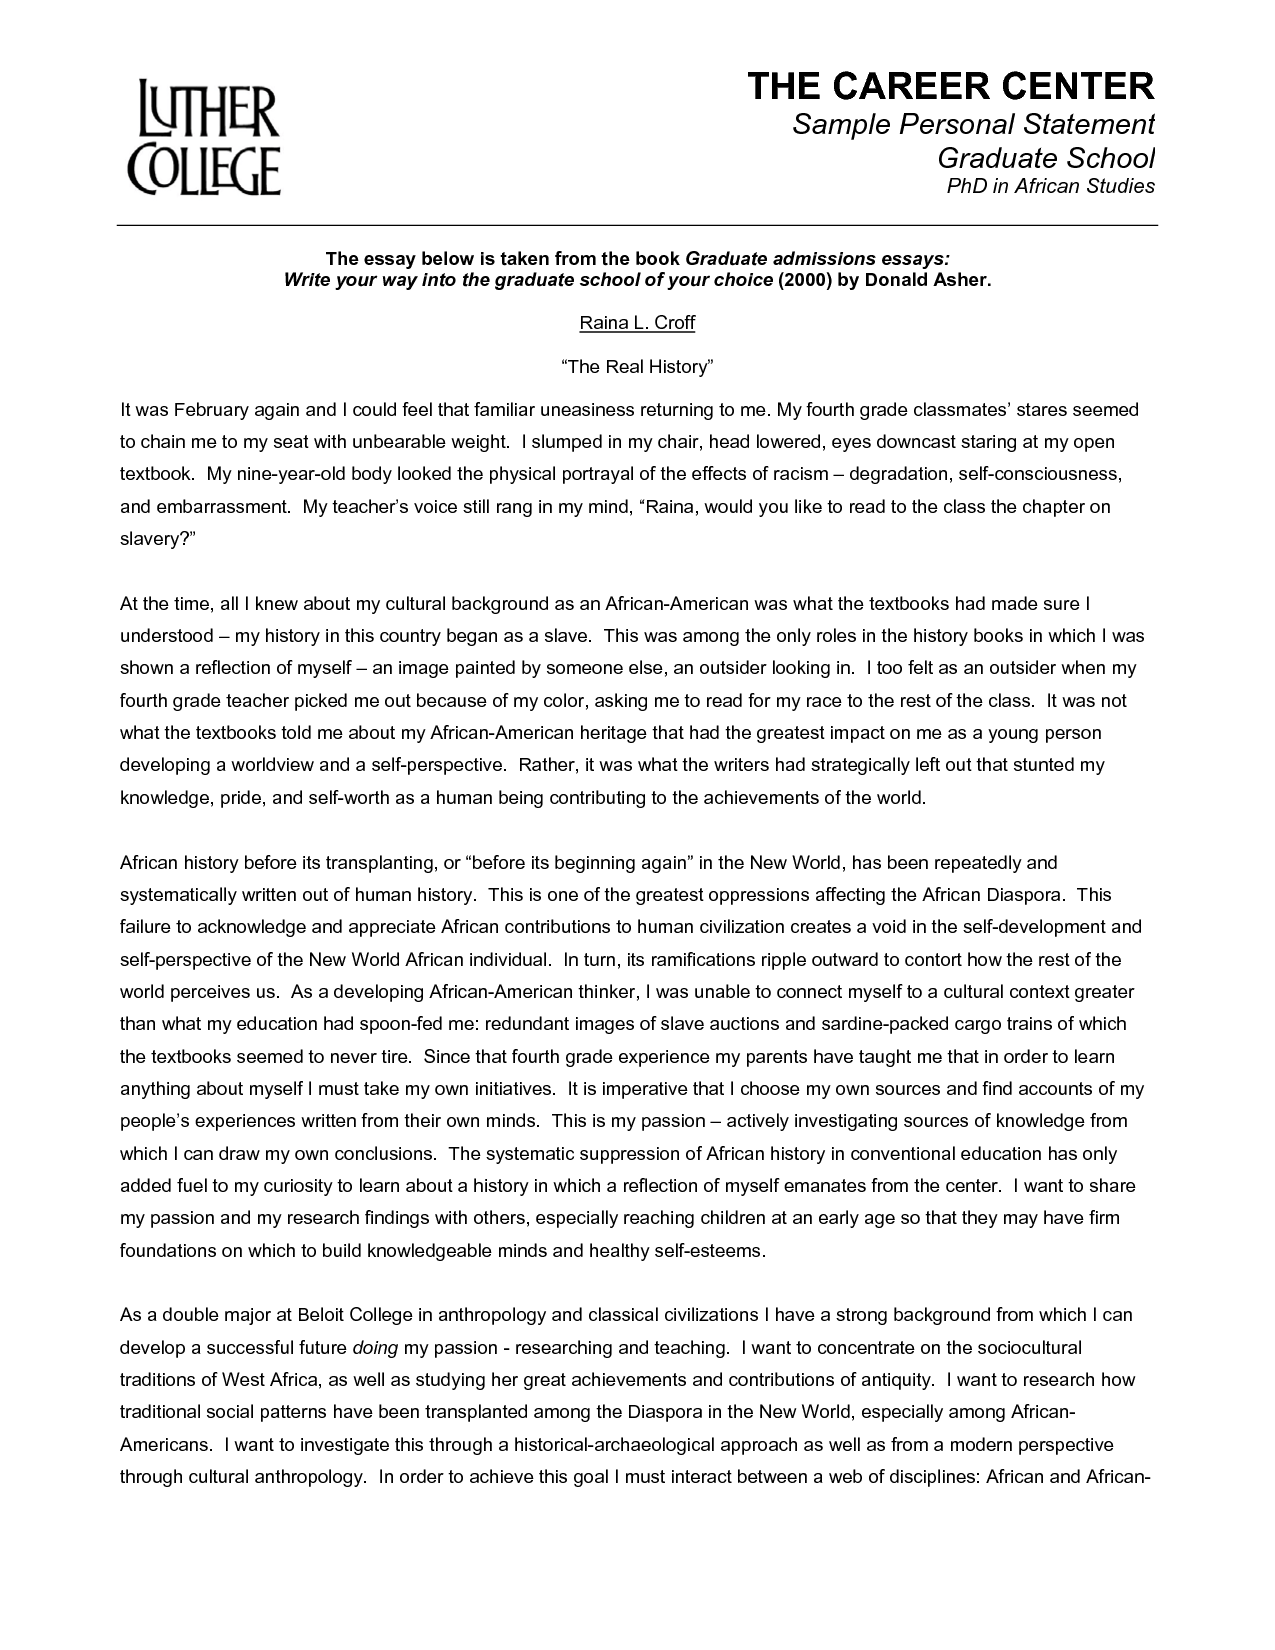 005 Free Sample Essay For Graduate School Admission Formidable Pdf Full